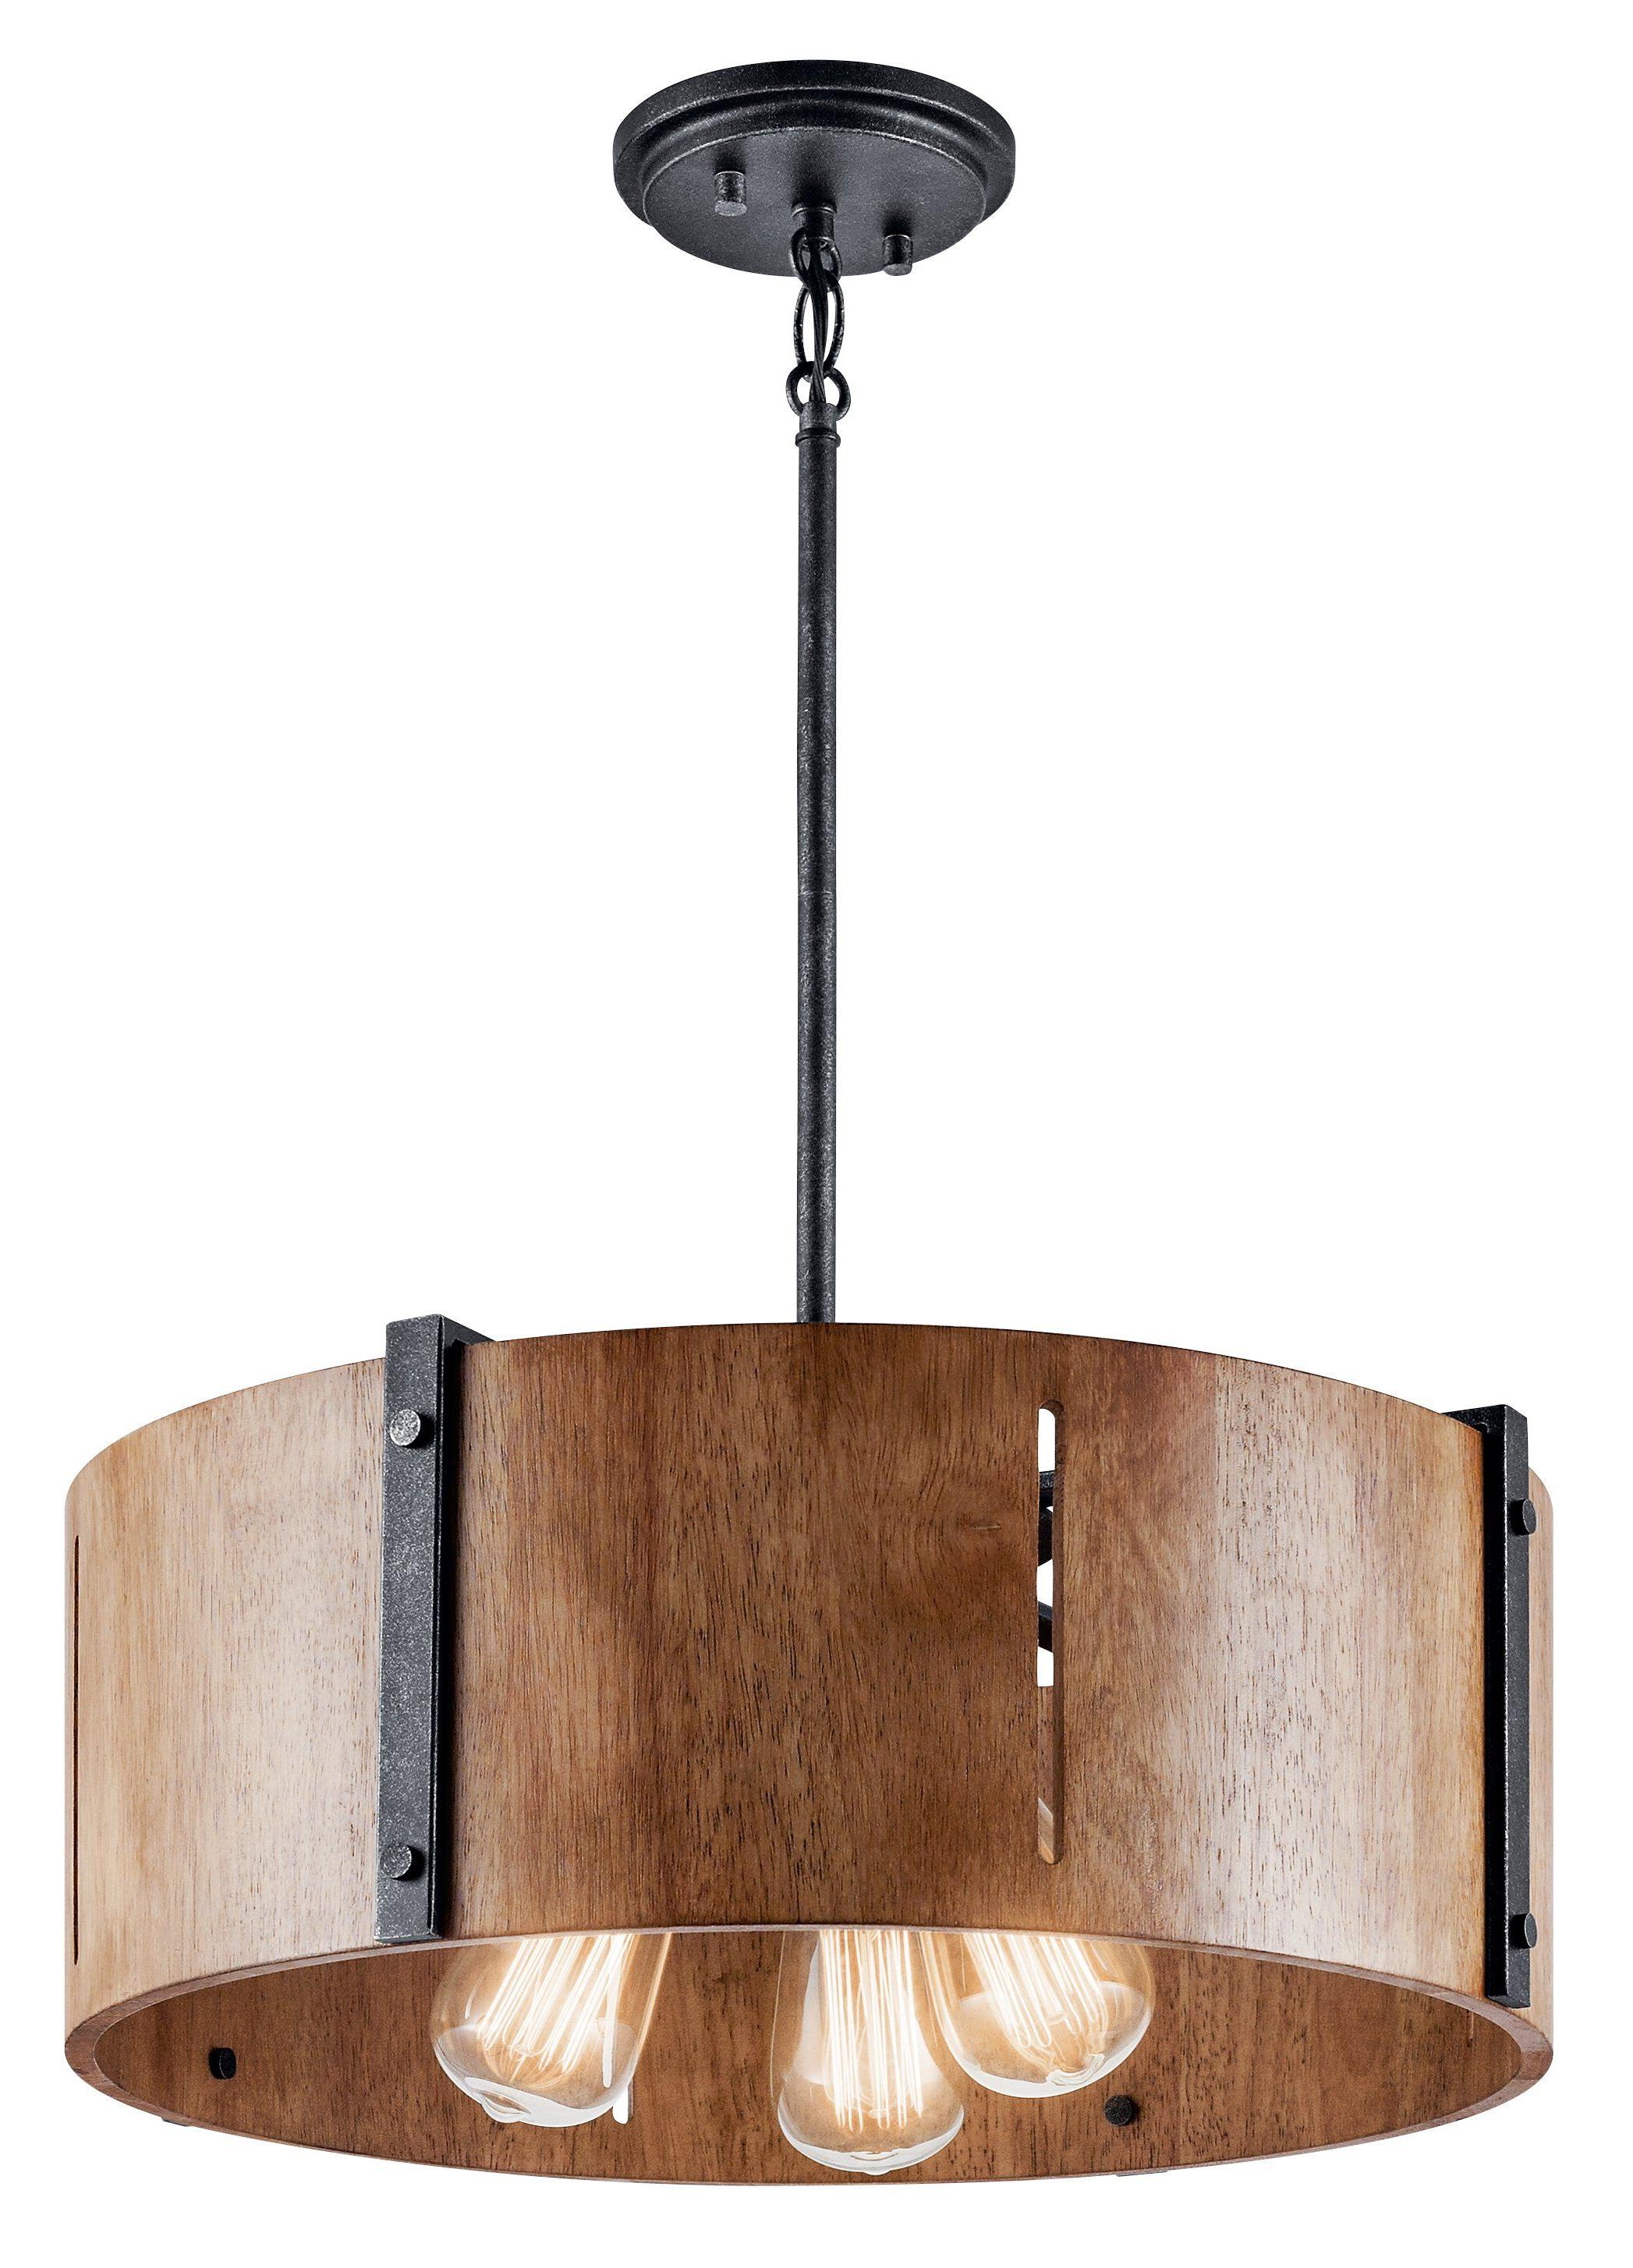 Popular Montes 3 Light Drum Chandeliers Regarding Elbur Pendant/semi Flush 3 Light – Distressed Black In 2019 (Gallery 19 of 20)